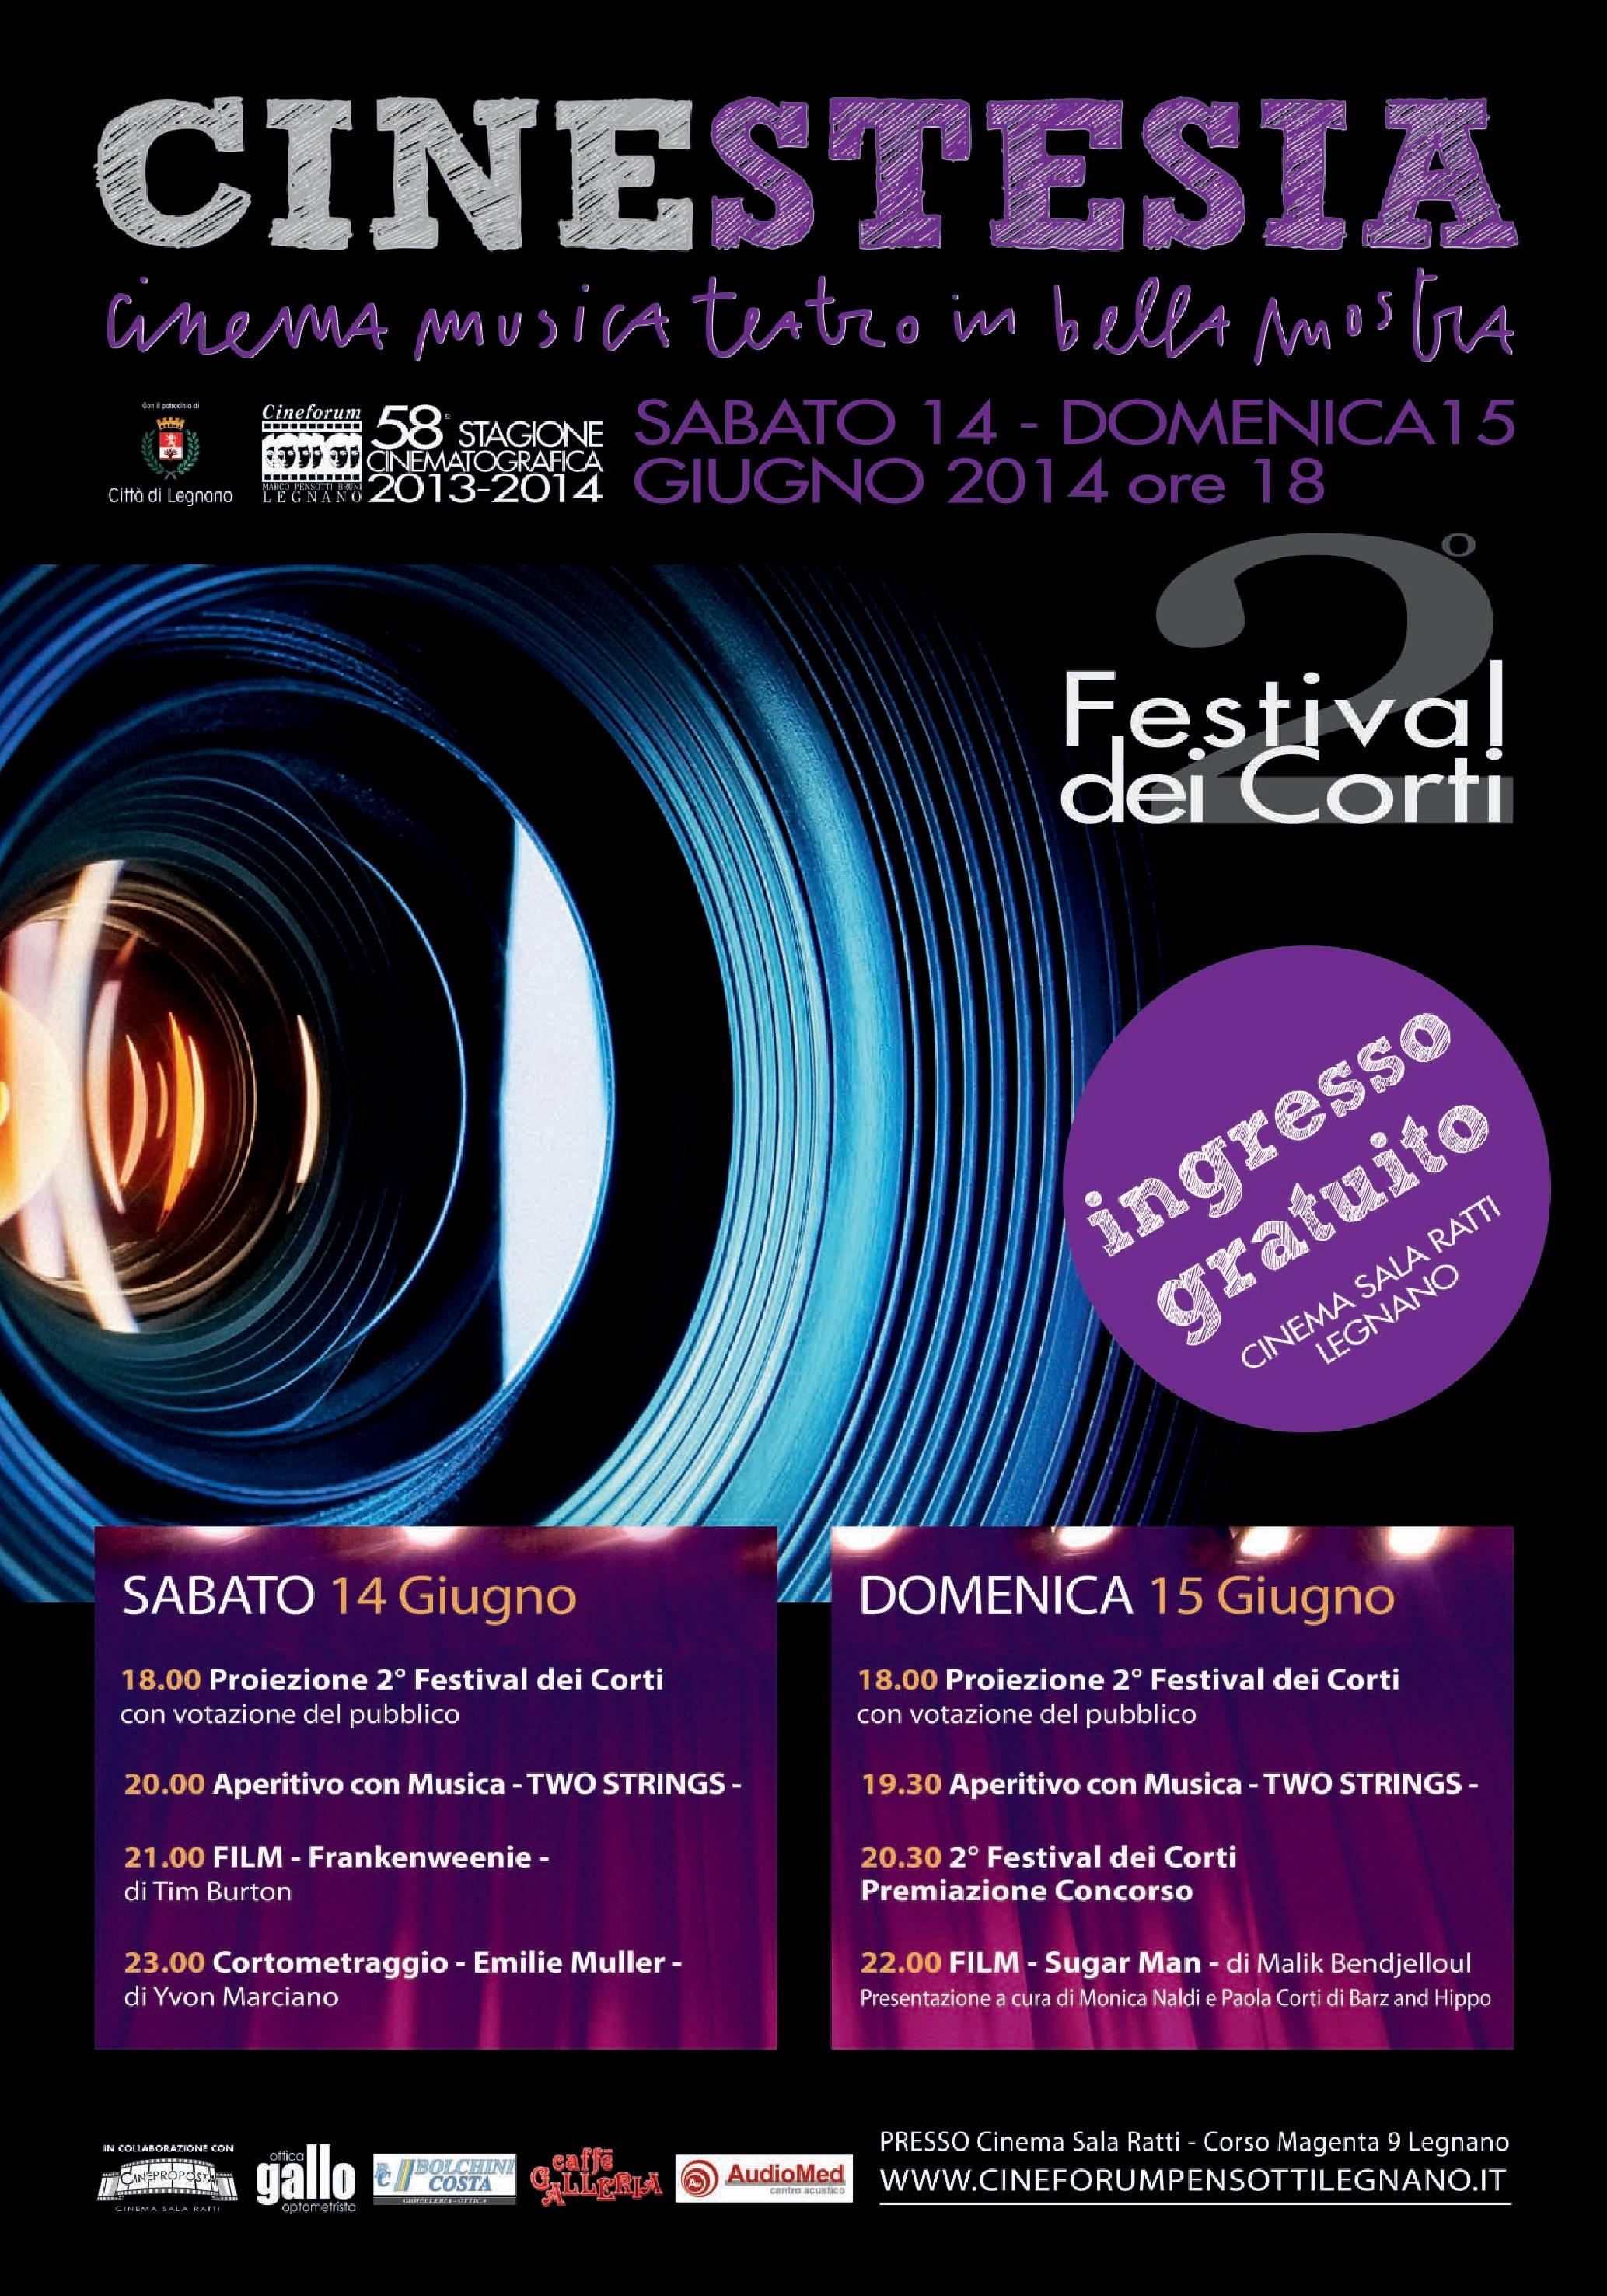 Locandina_70x100_Cinestesia2014_bassa-page-001